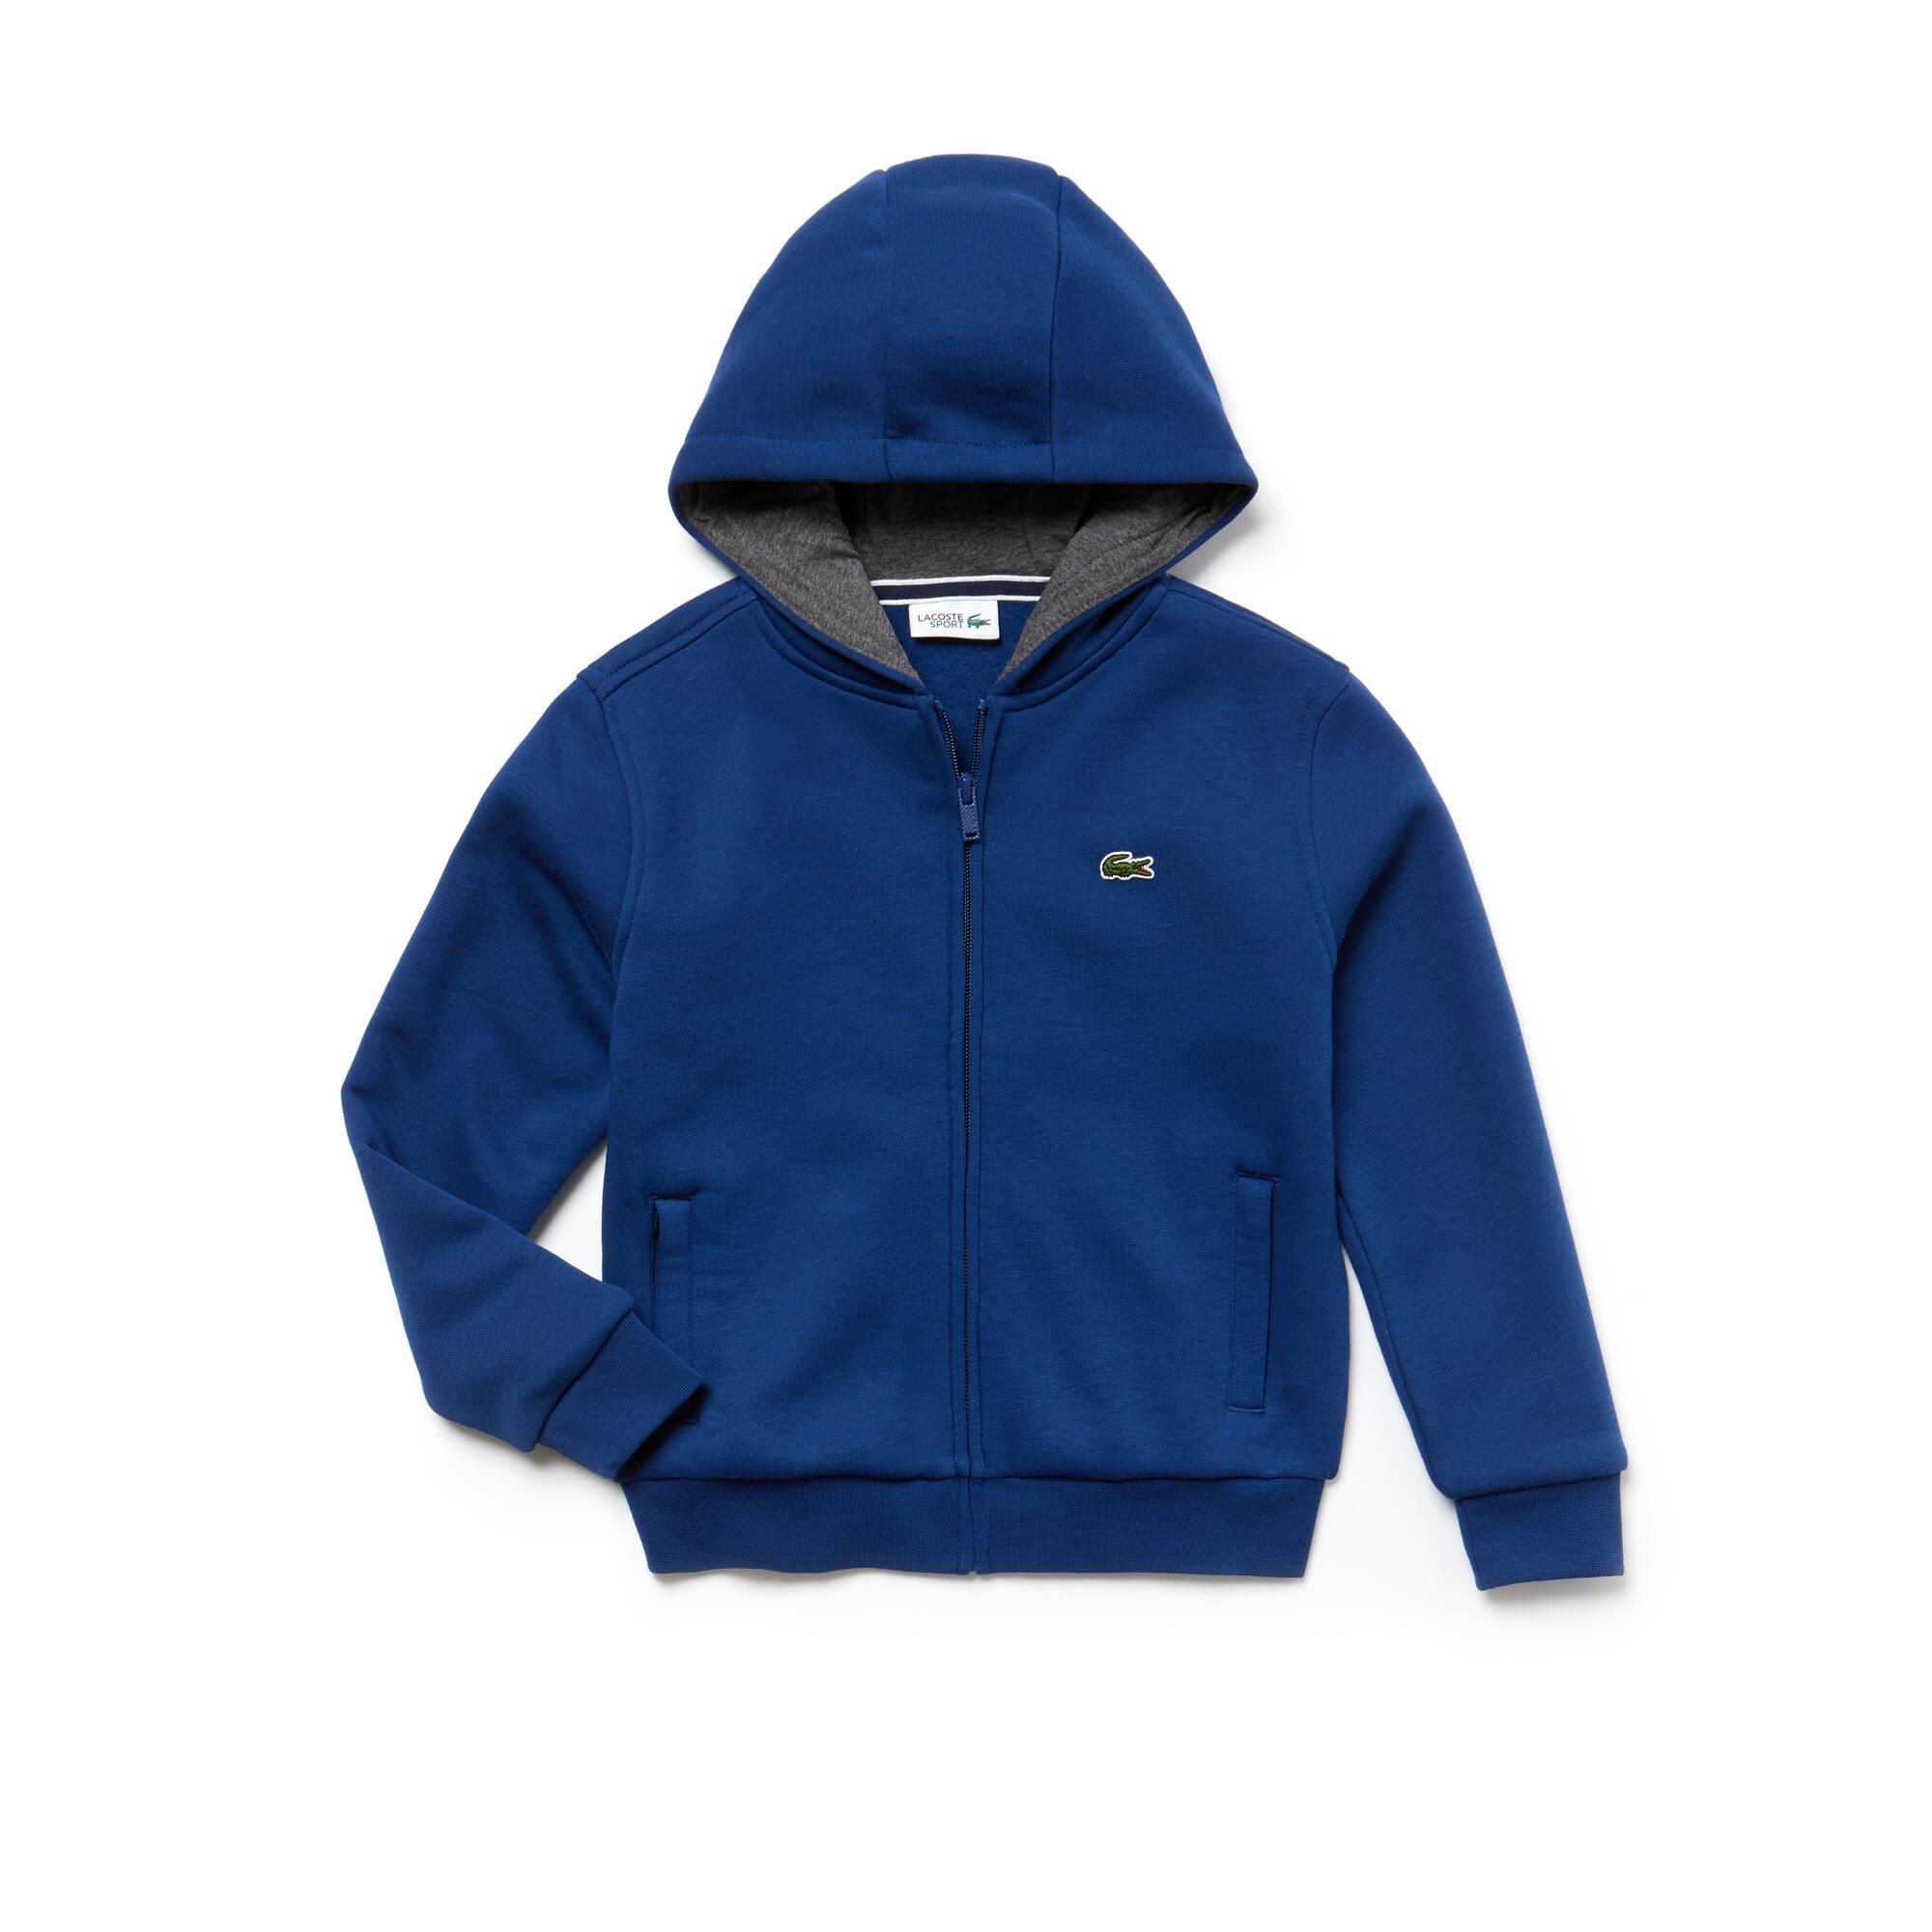 Kinder-Sweatjacke aus Baumwoll-Fleece LACOSTESPORT TENNIS